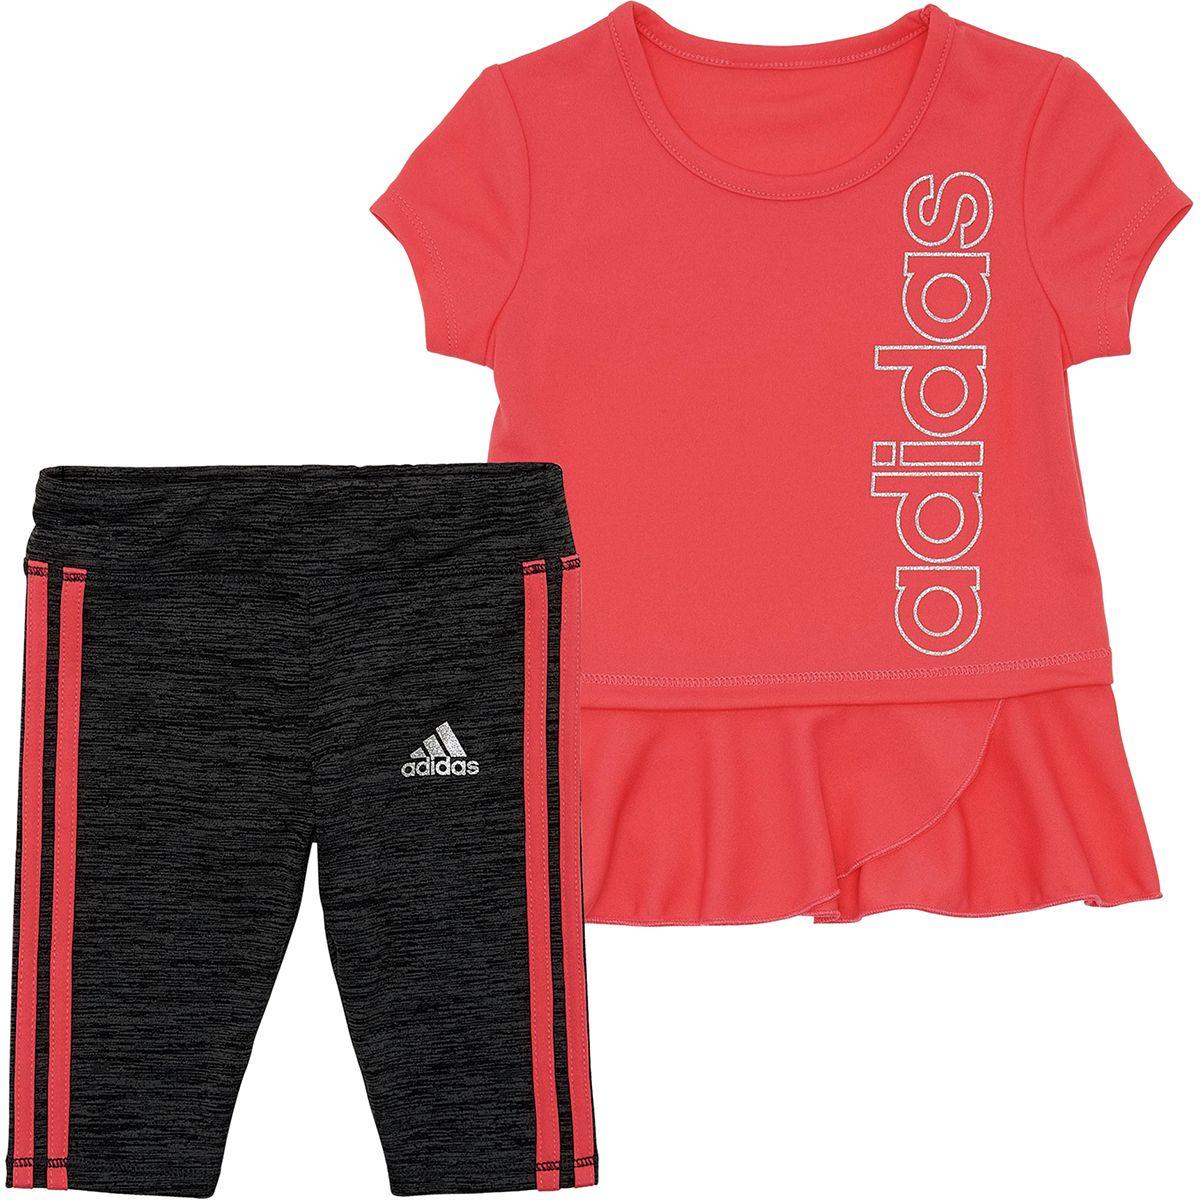 Adidas 3 Stripe Capri Tight Set Infant Girls